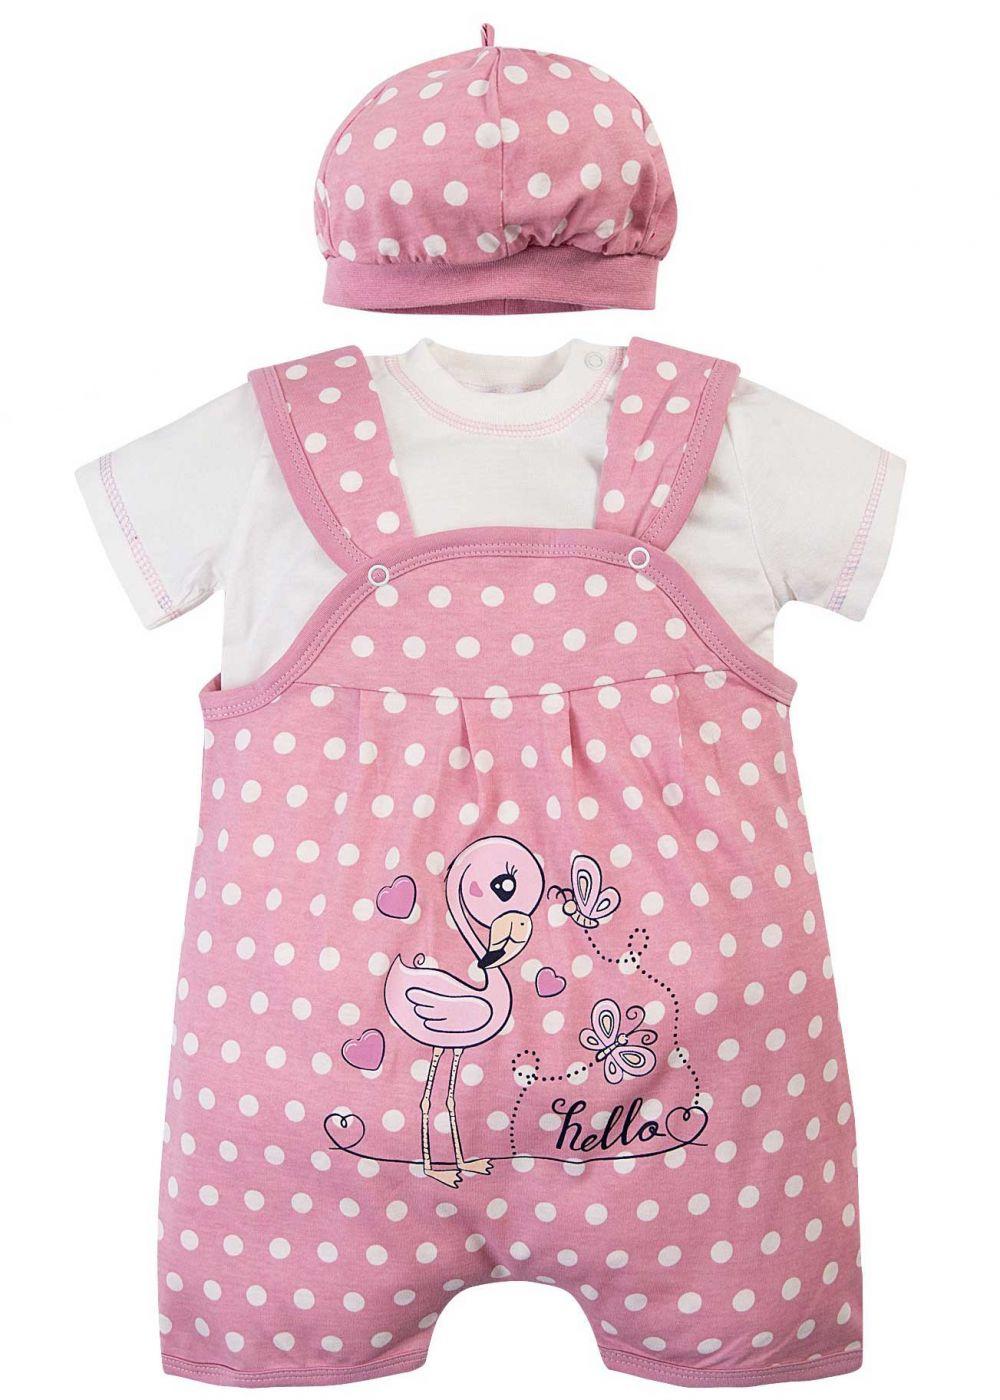 Комбинезон для новорожденных комплект Bonito фламинго